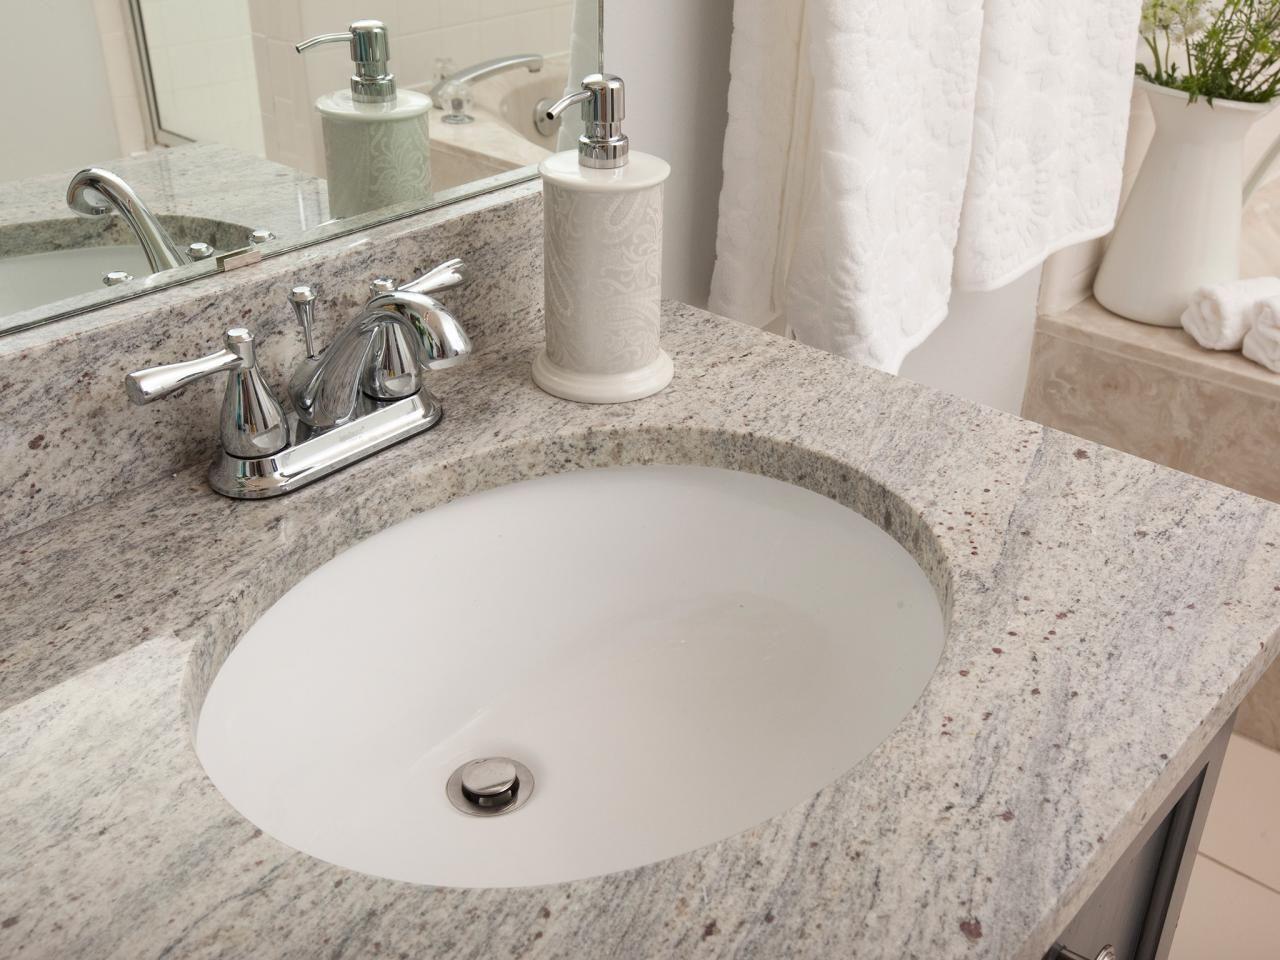 stylish oval bathroom sinks design-Amazing Oval Bathroom Sinks Decoration